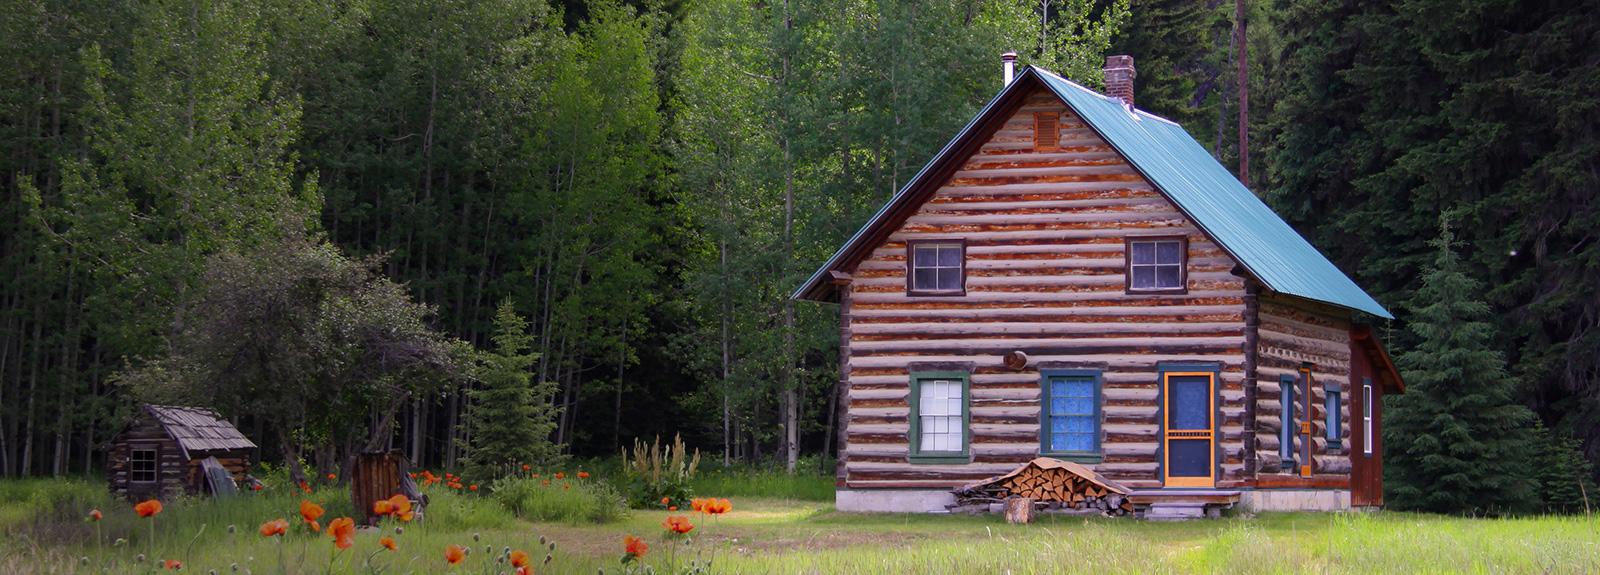 Montana home warranty and insurance companies top reviews